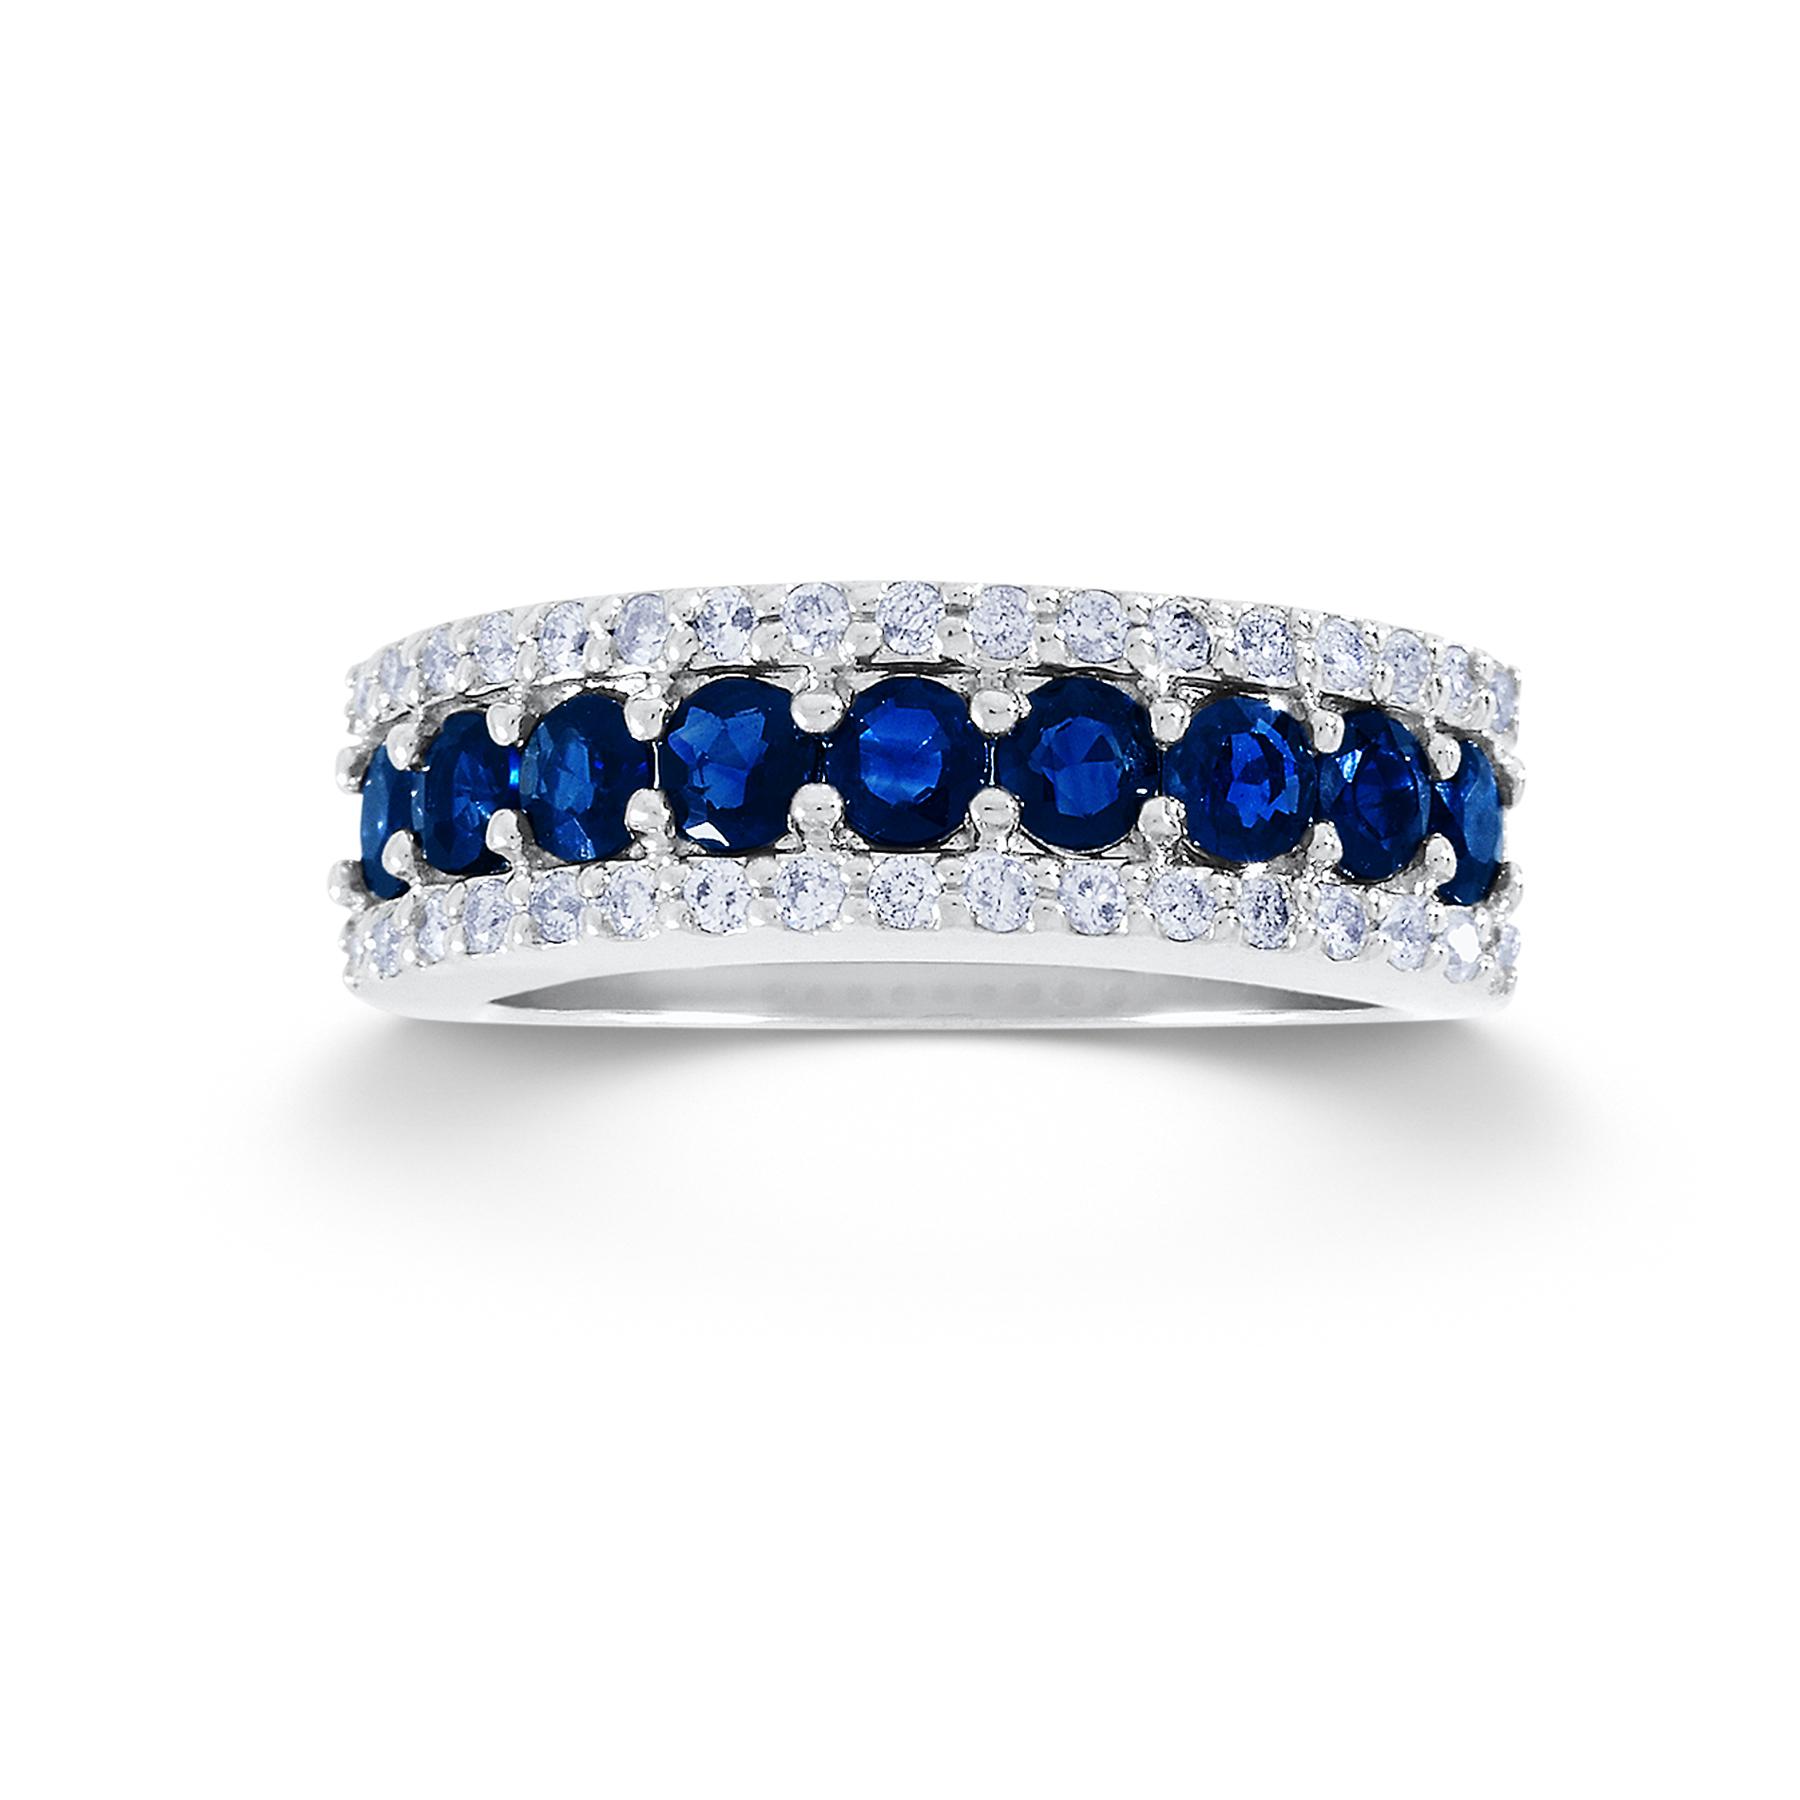 13 Cttw Round 10k White Gold Diamond Amp Sapphire Wedding Band